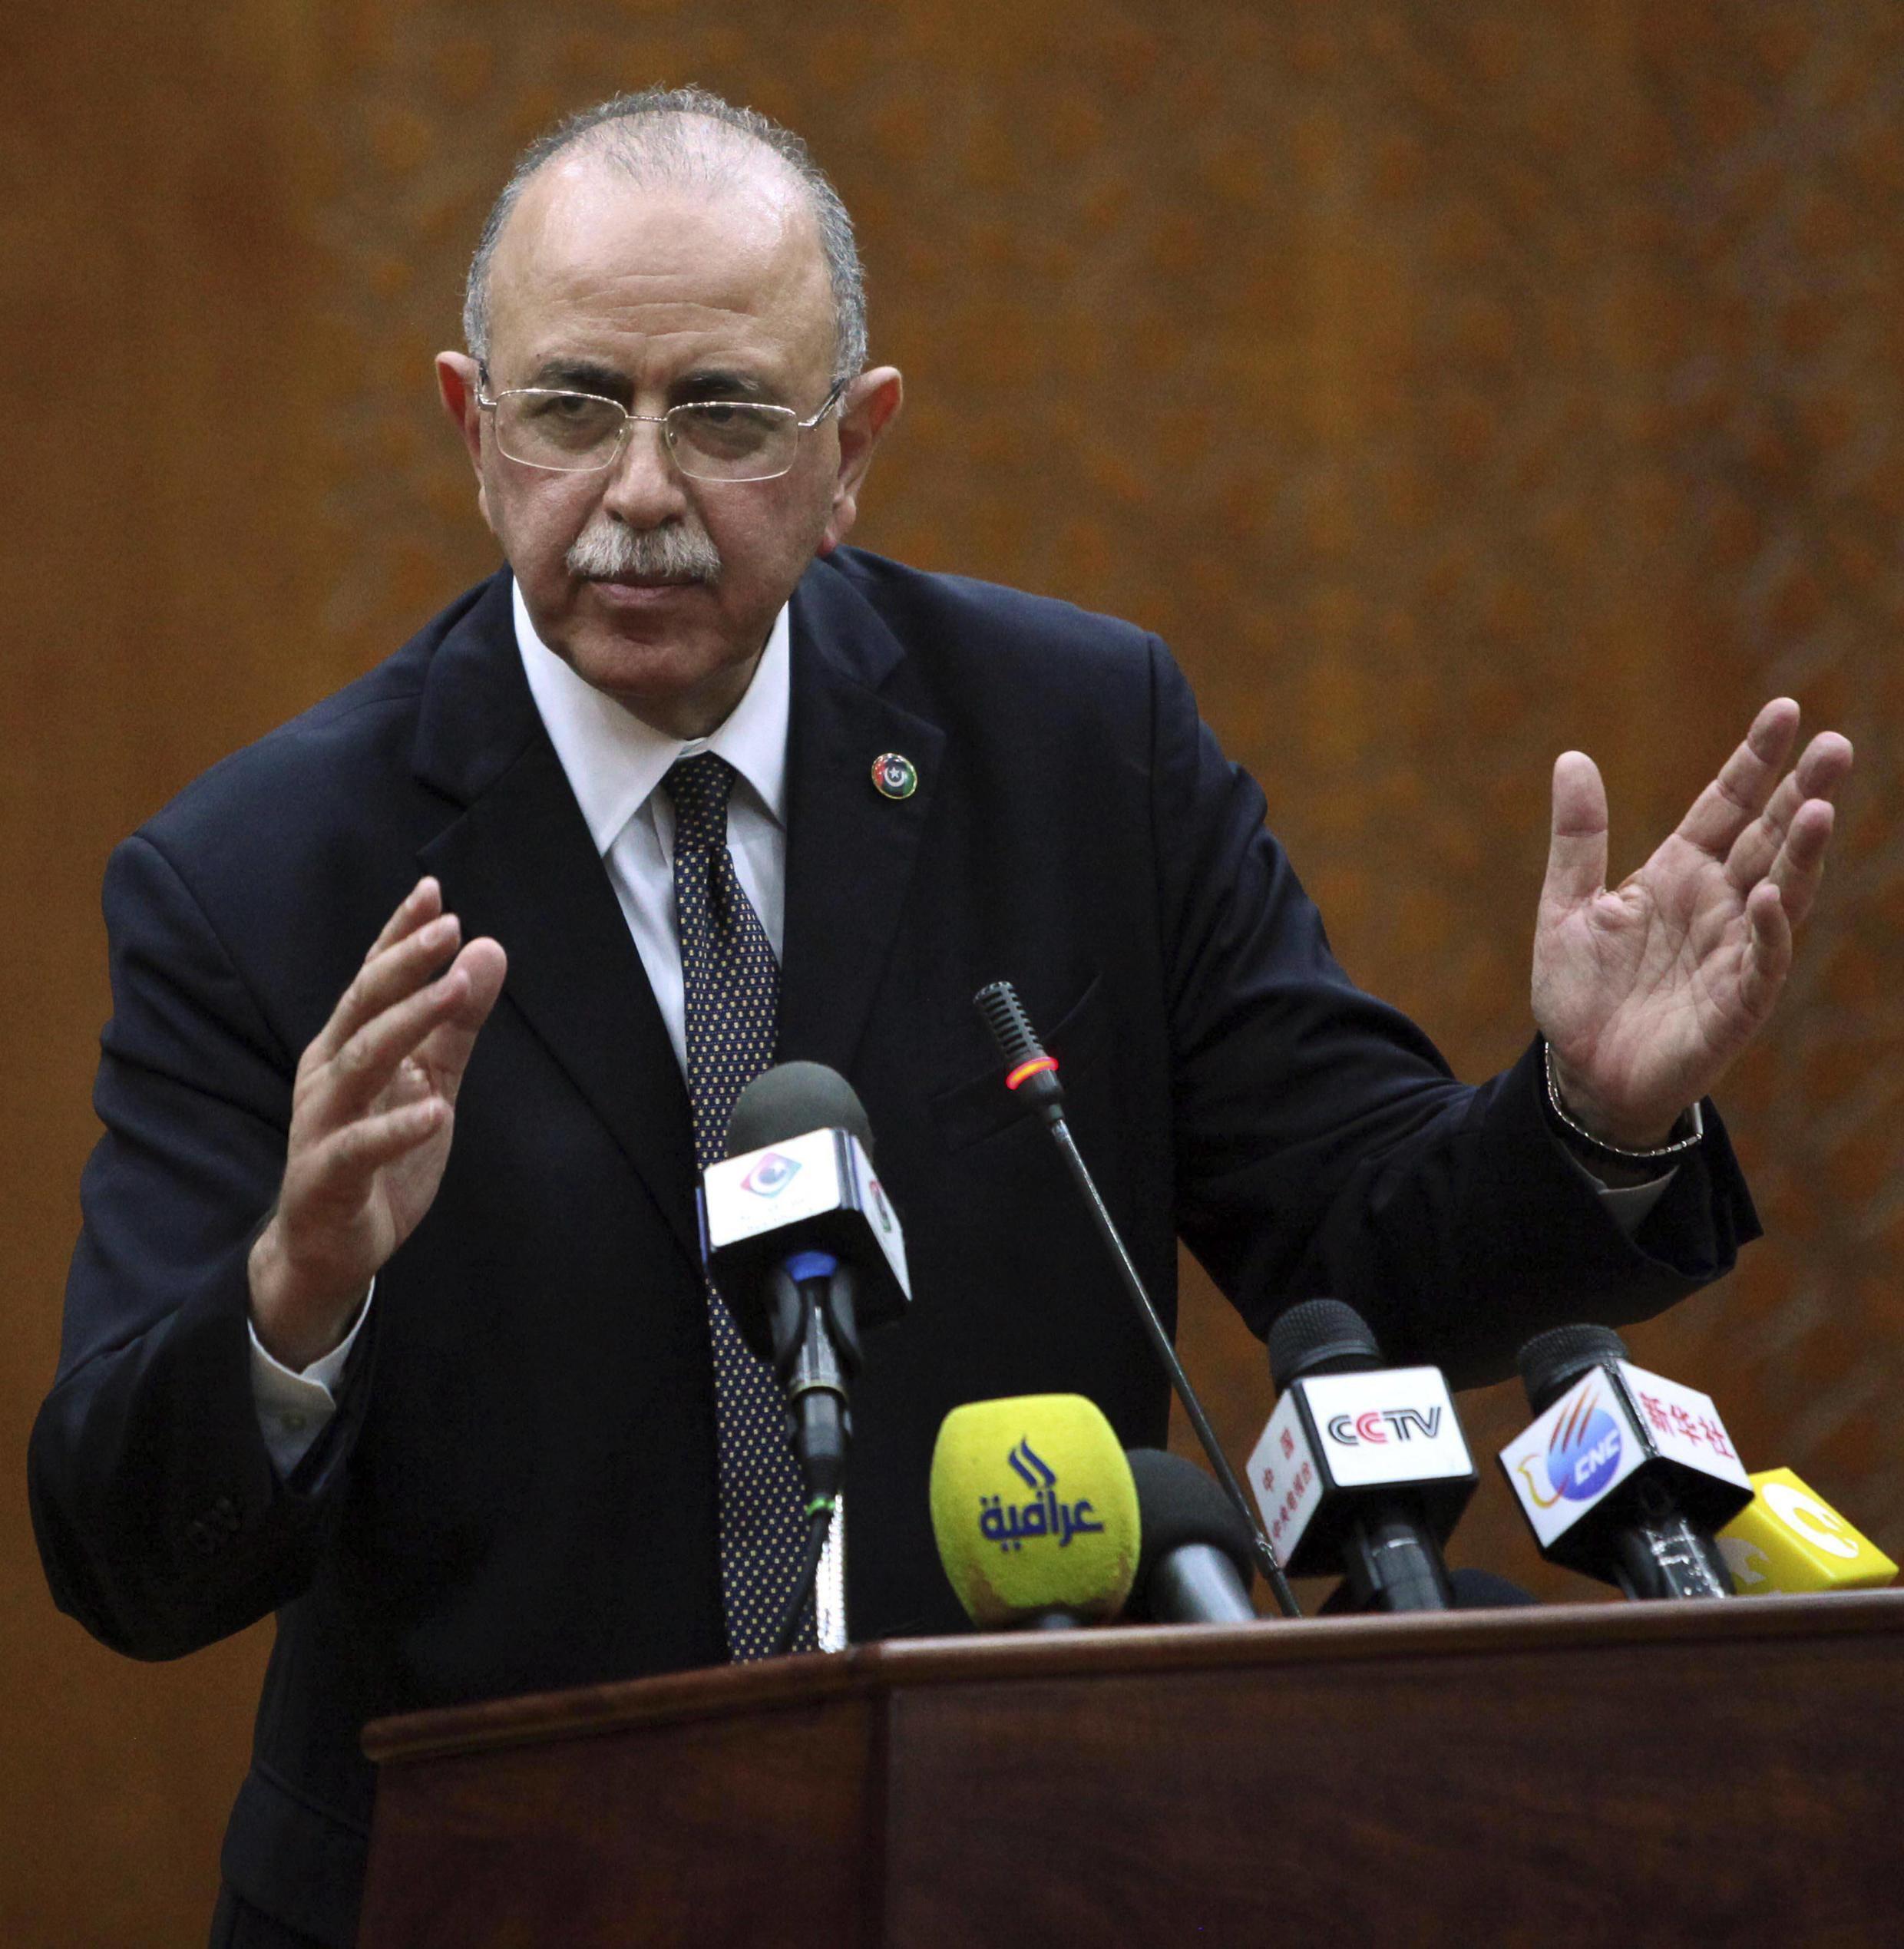 Libya's newly elected Prime Minister Abdurrahim el-Keib